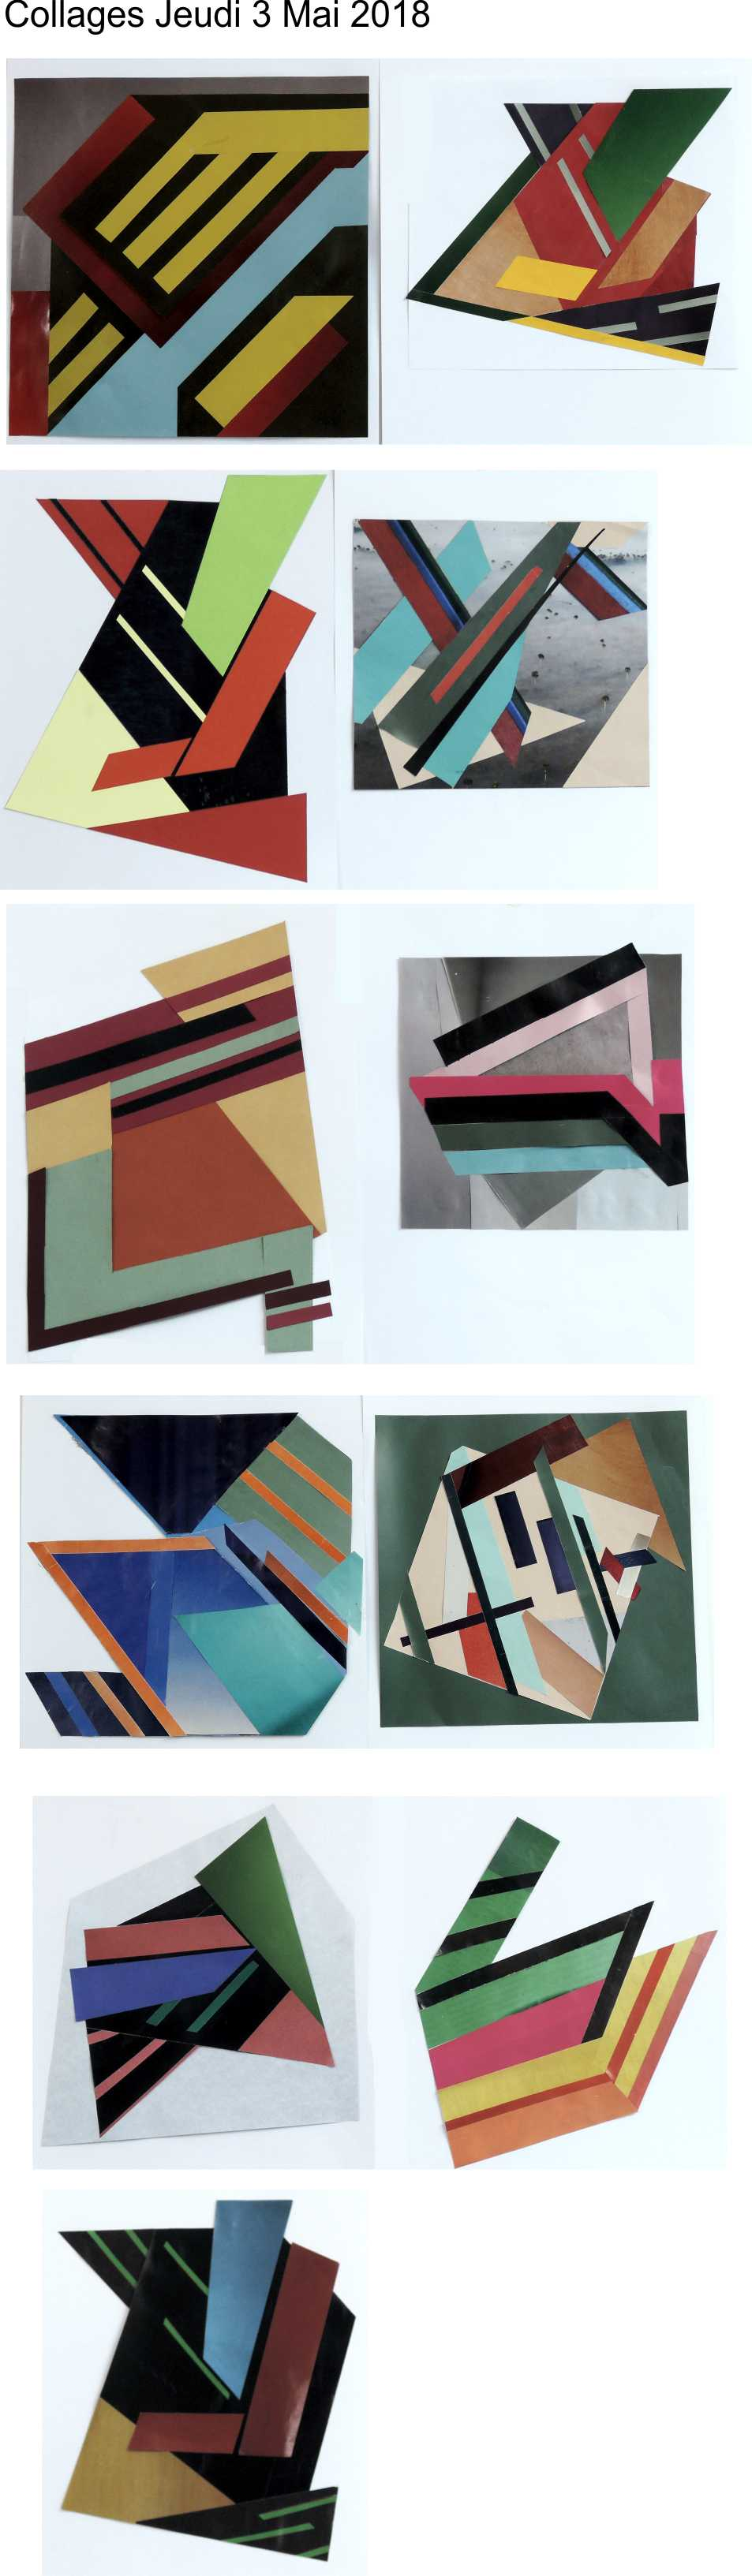 Collages Frank Stella jeudi 3 mai 2018